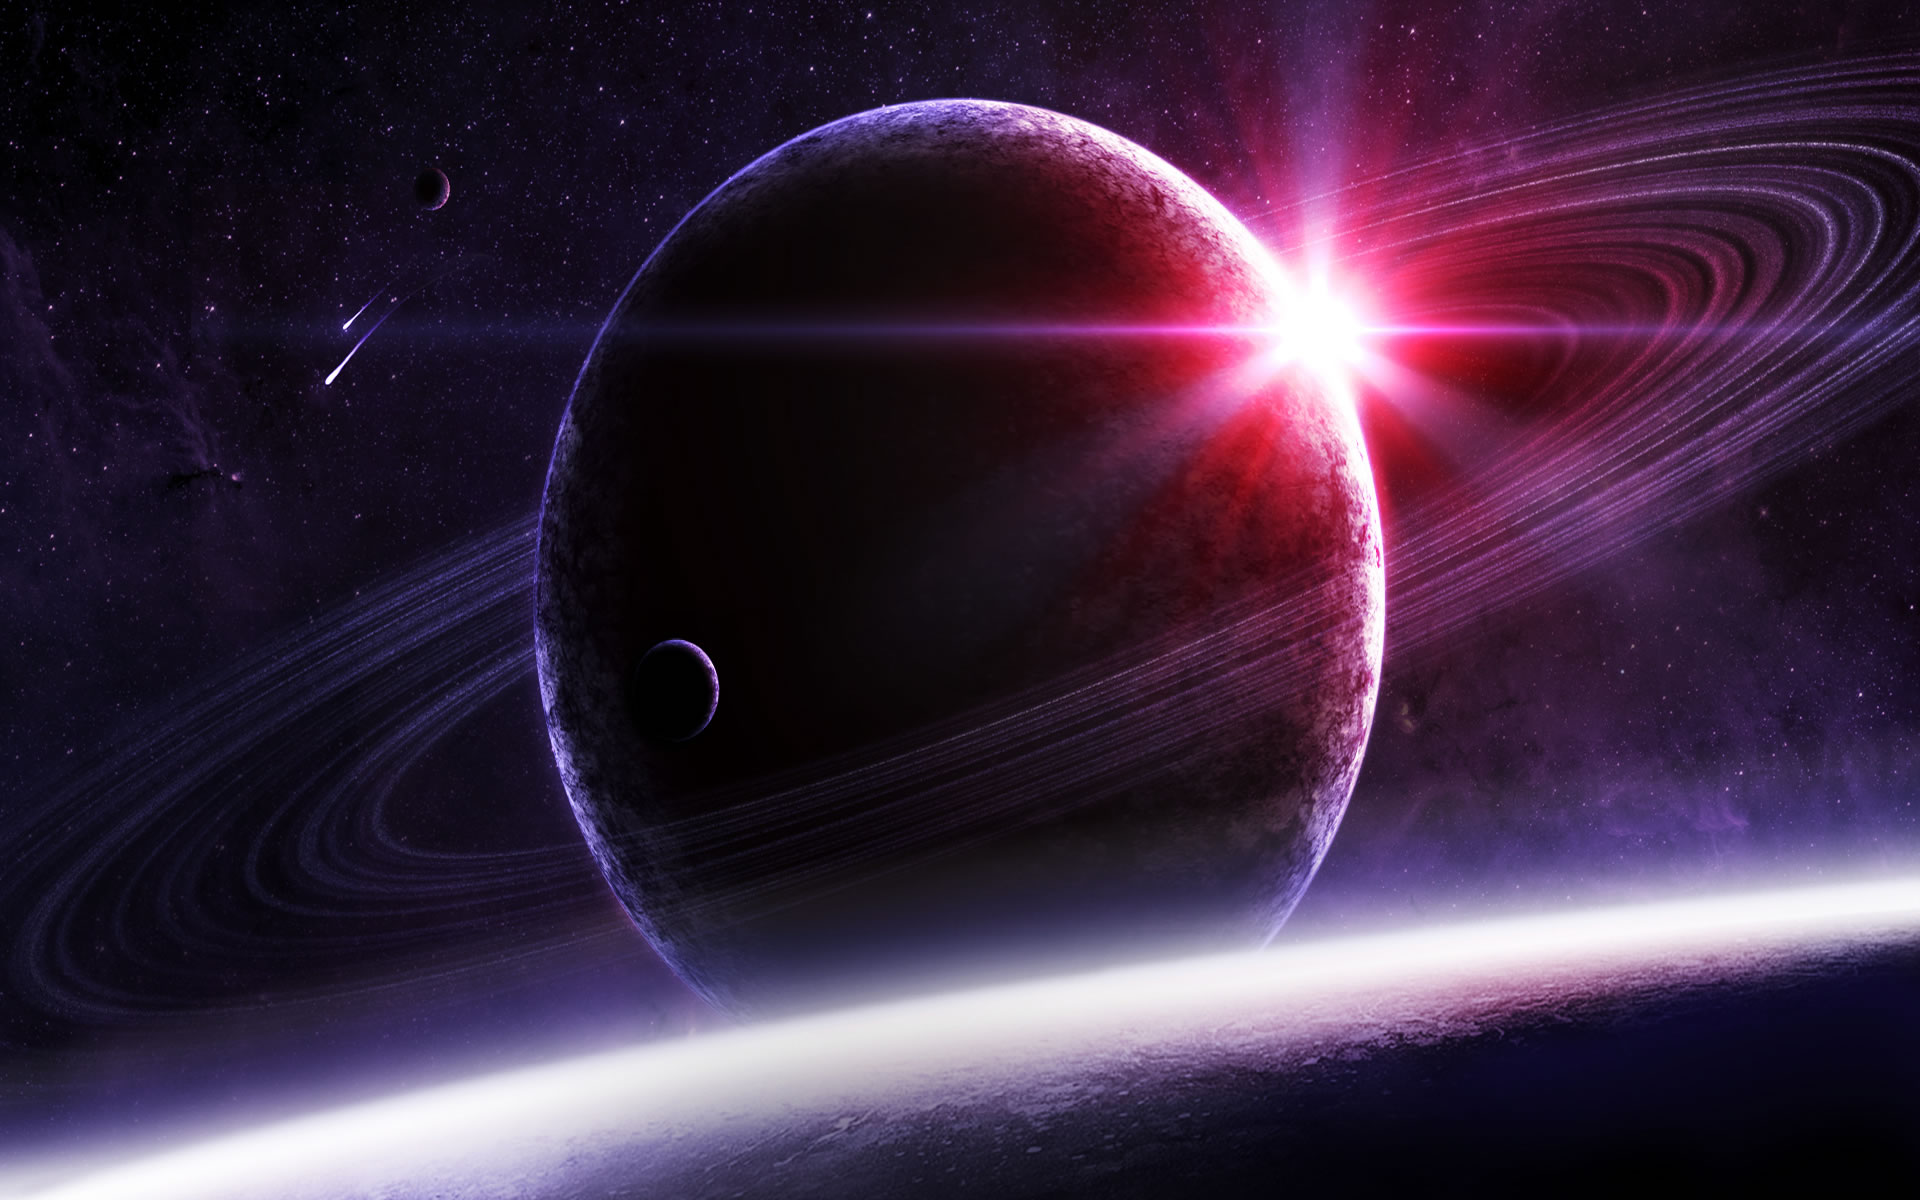 Wallpaper Planetas Lejanos